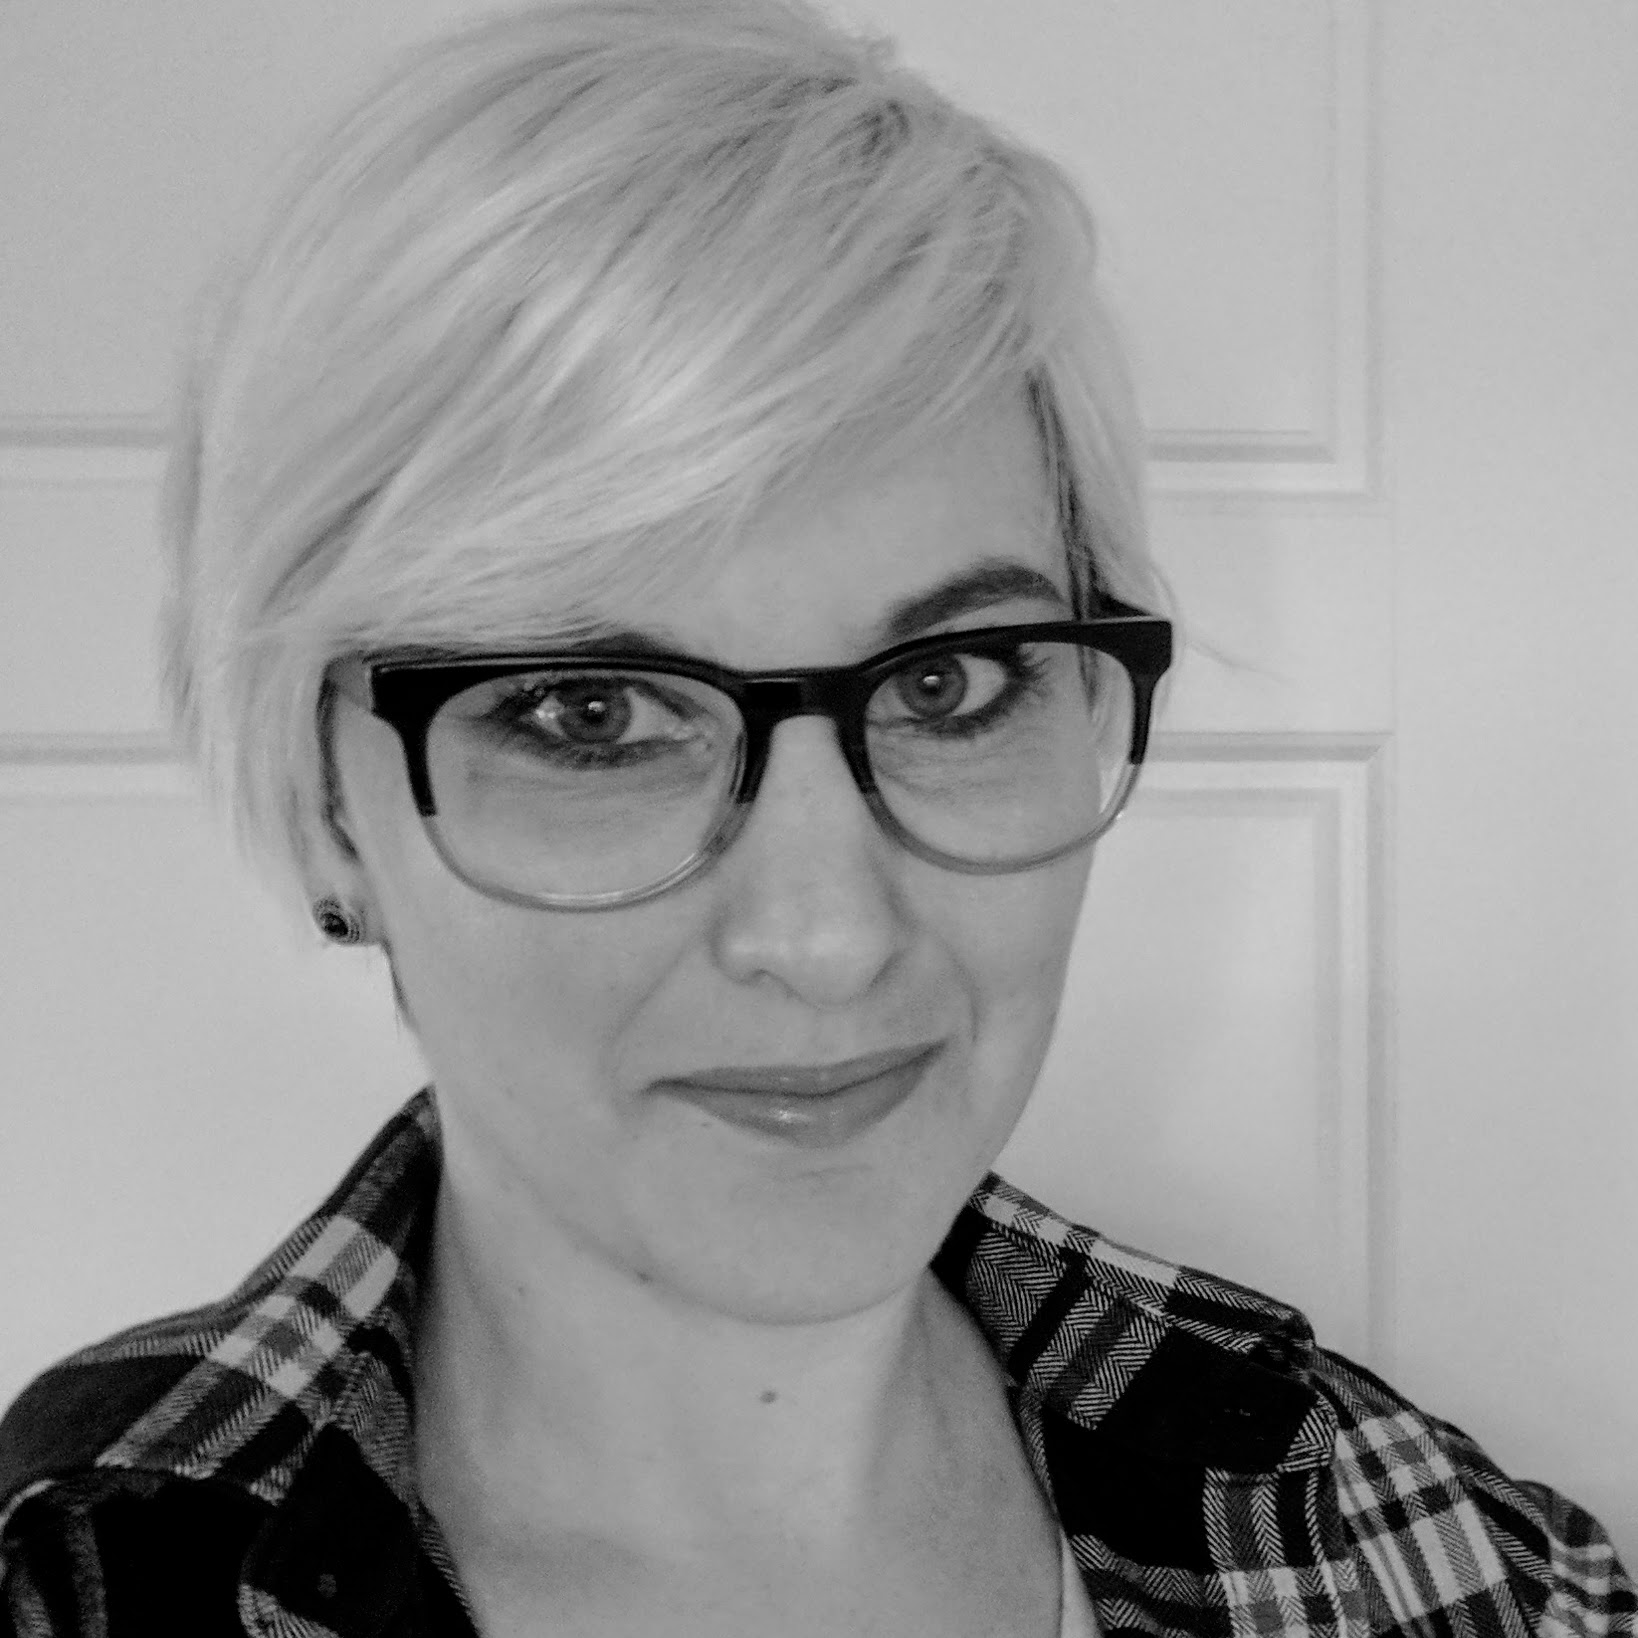 Alaena VanderMost